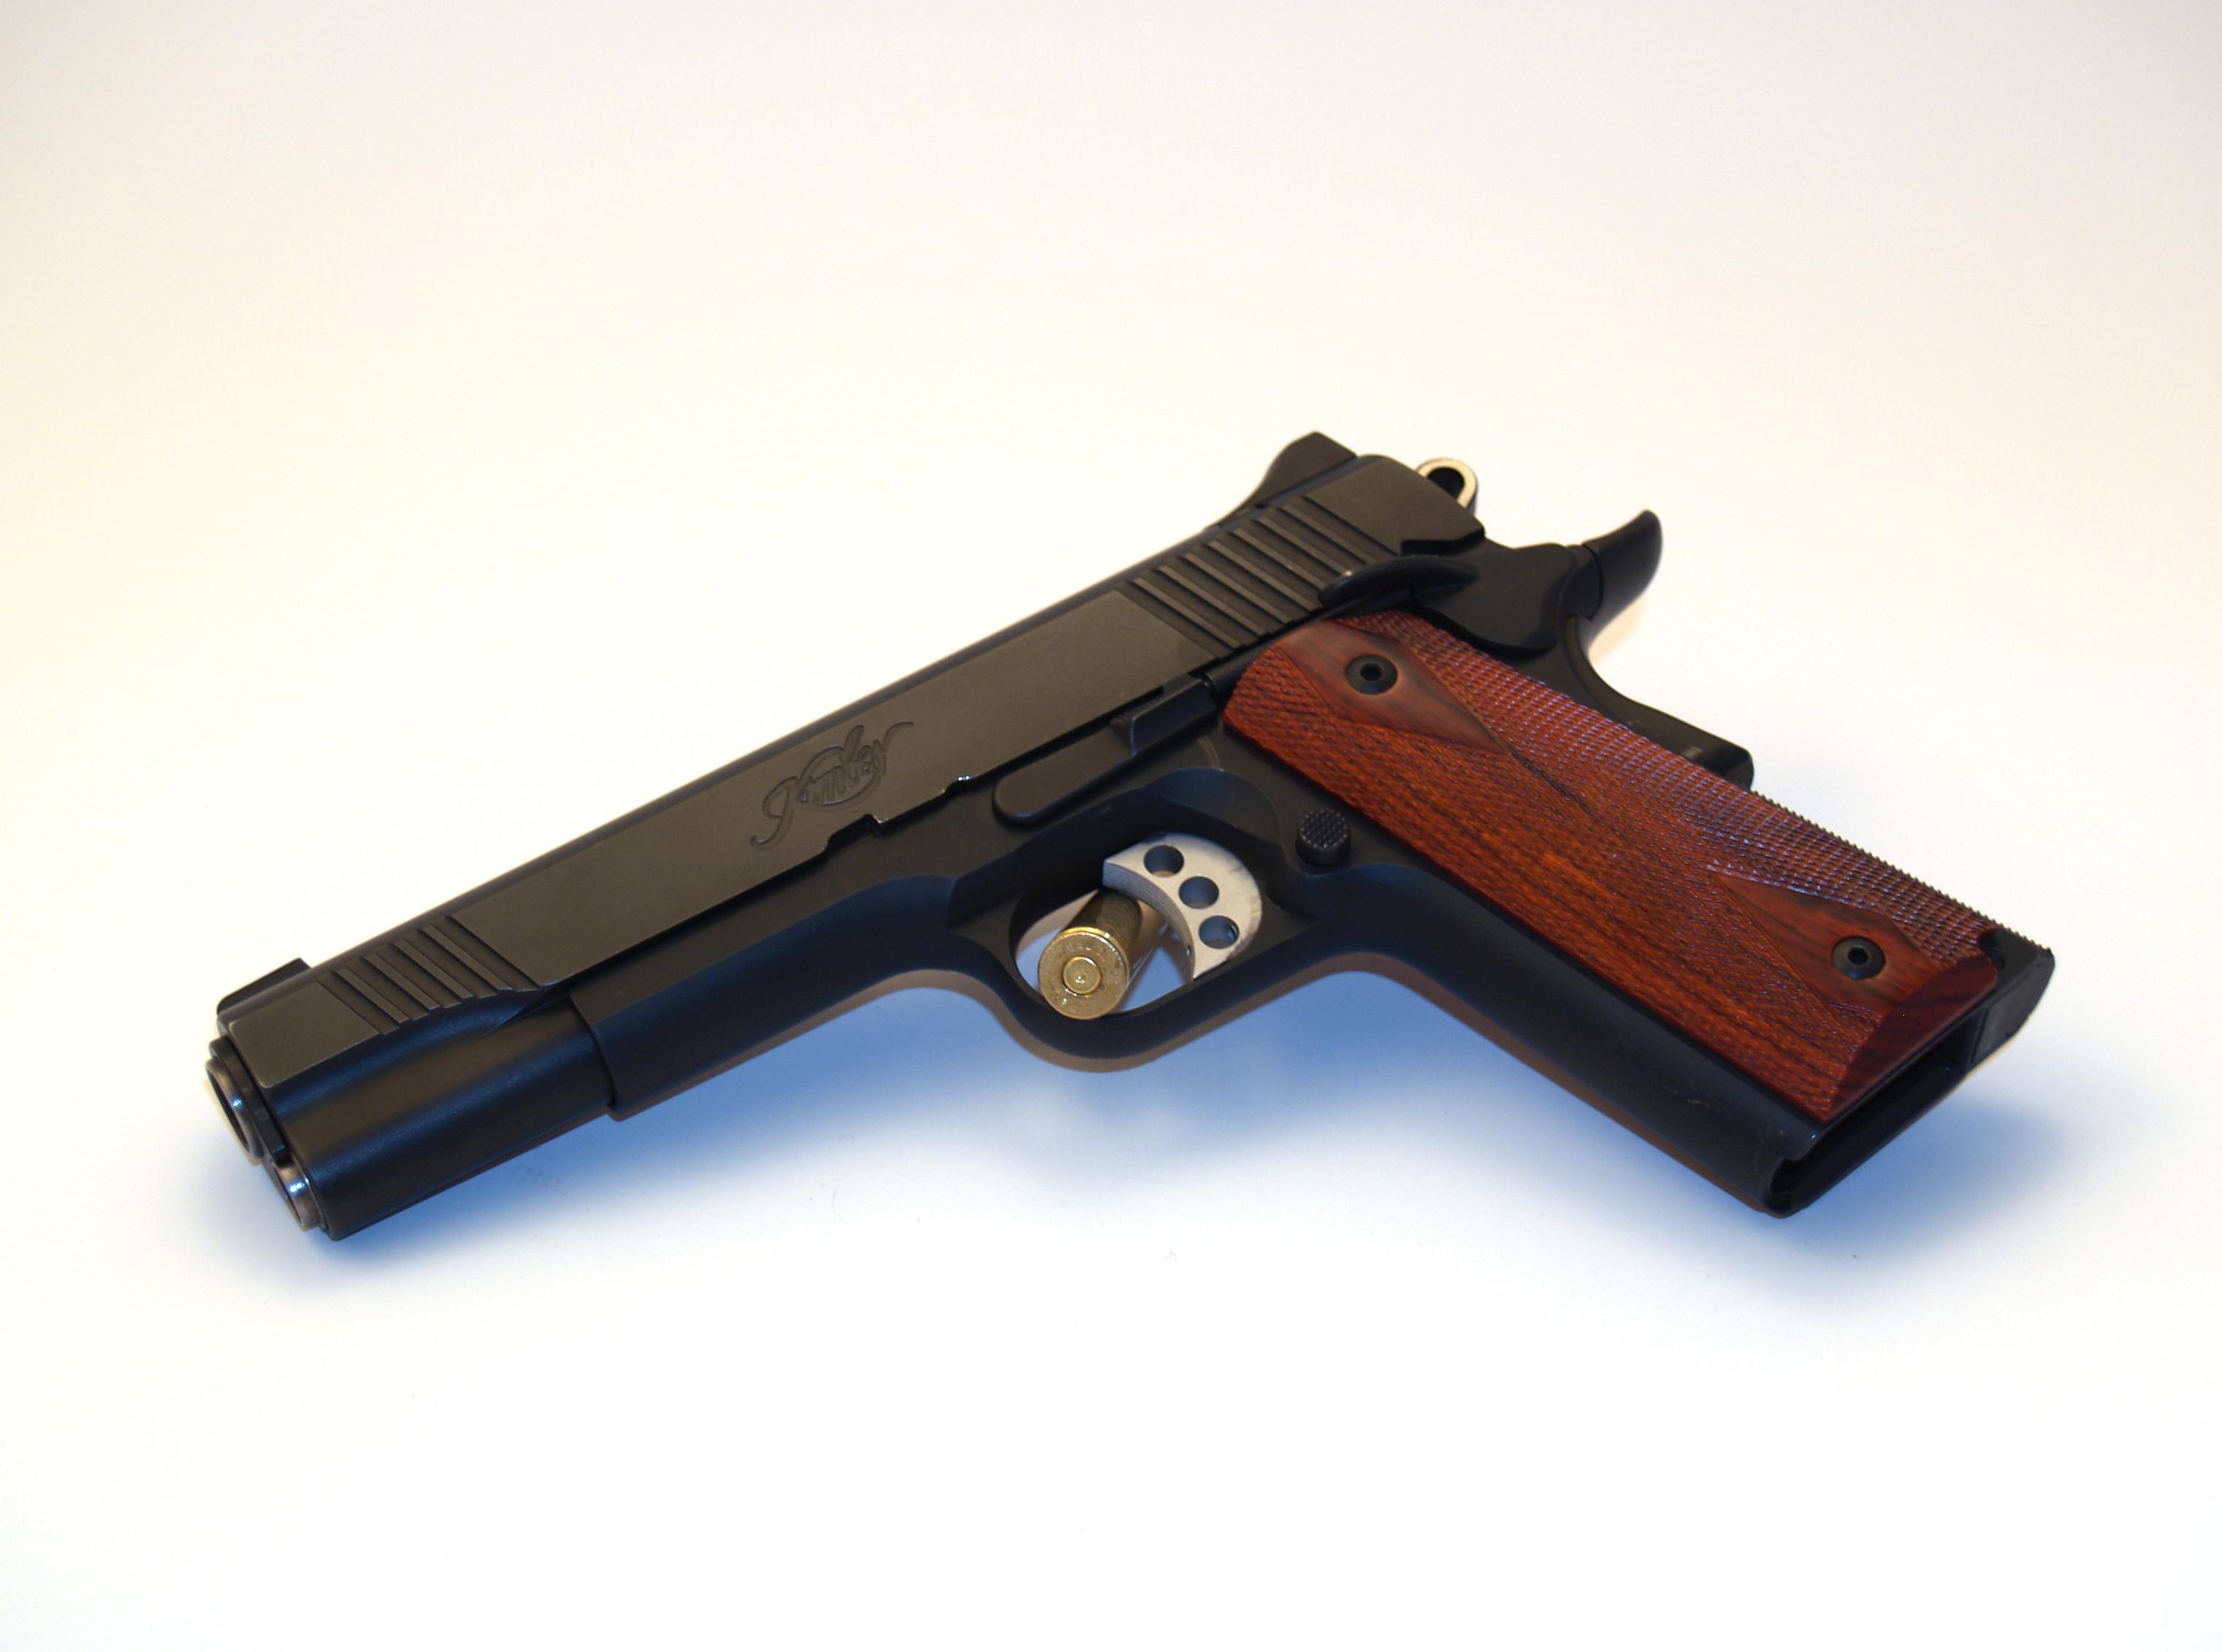 Colt .vs. Kimber .vs. Sig? - 1911 Forum